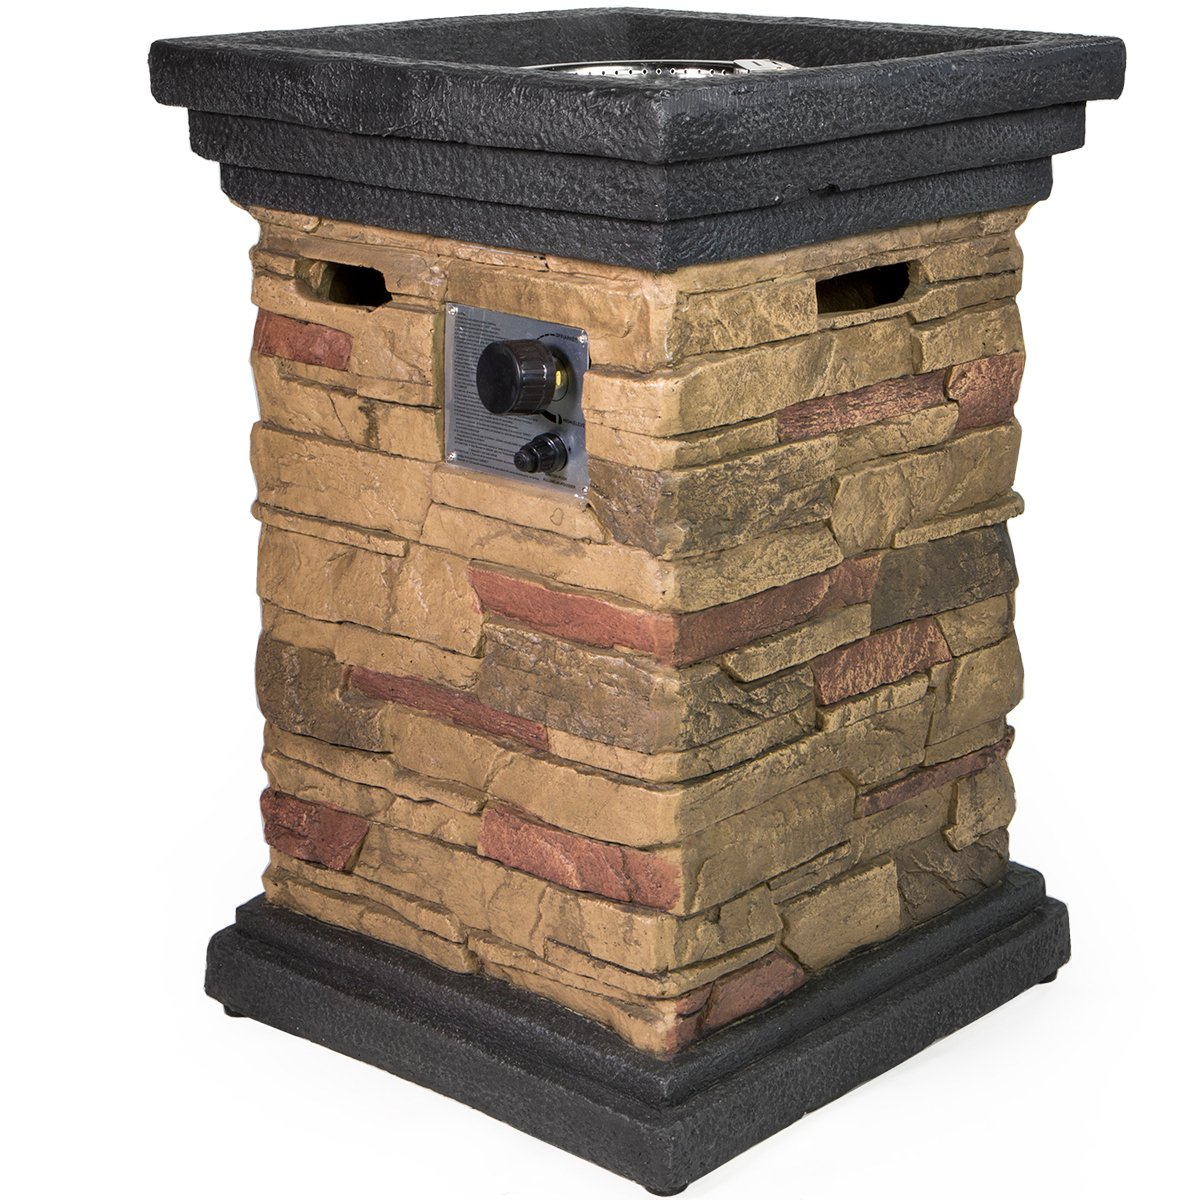 barton outdoor propane fire pits w cover column slate rock